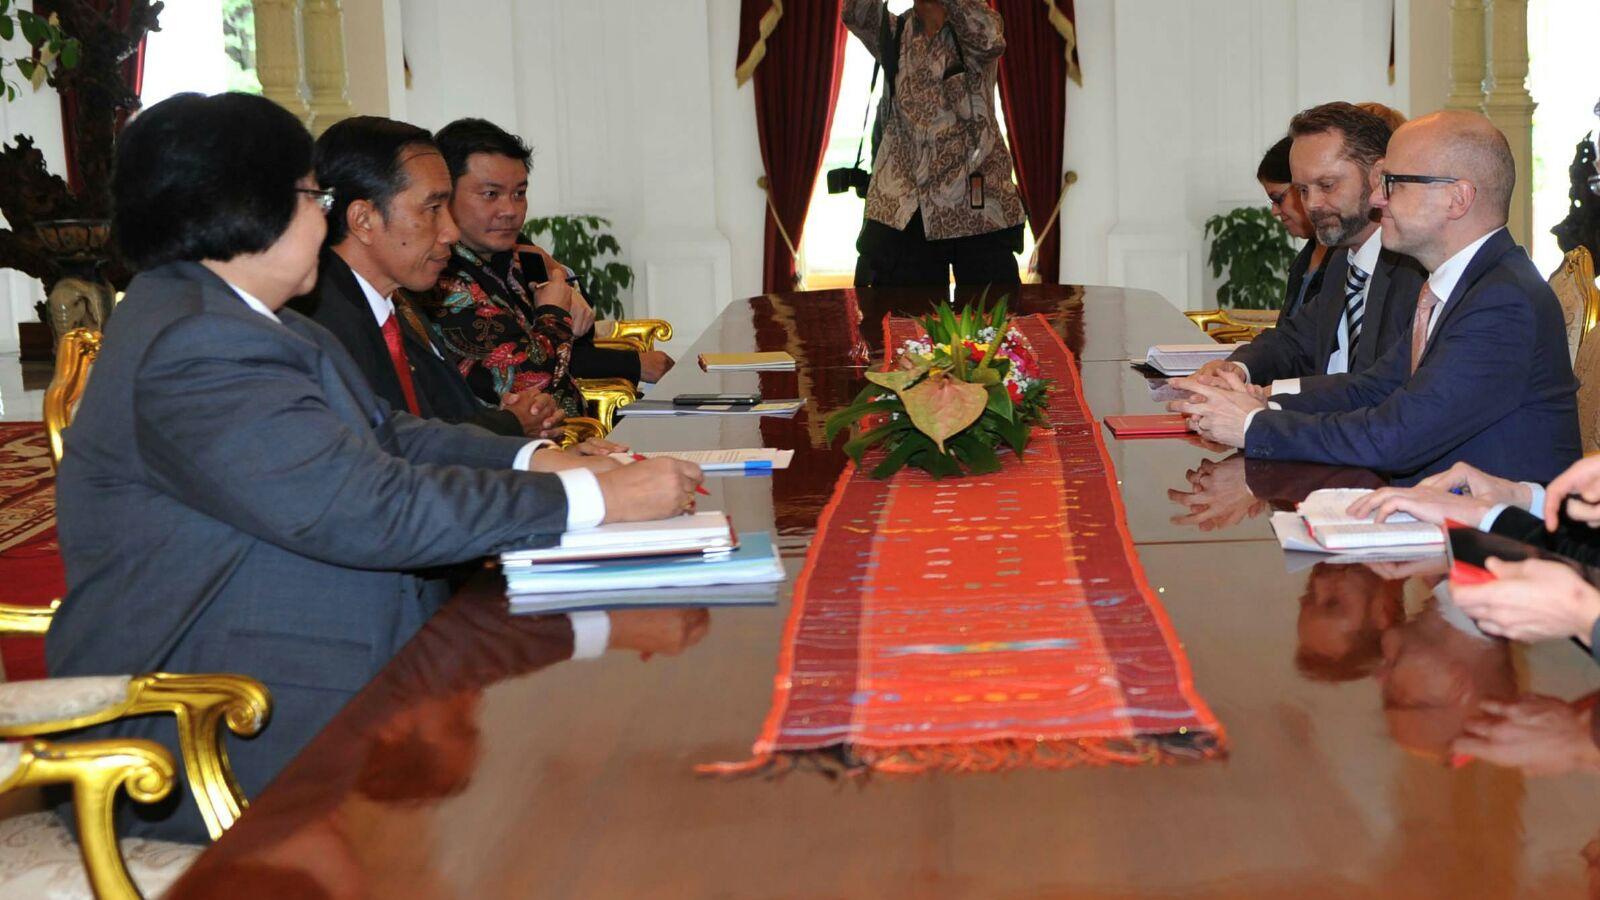 Bina-Qurani-Peran-Indonesia-Dalam-Perdamaian-Dunia-Melalui-Hubungan-Internasional